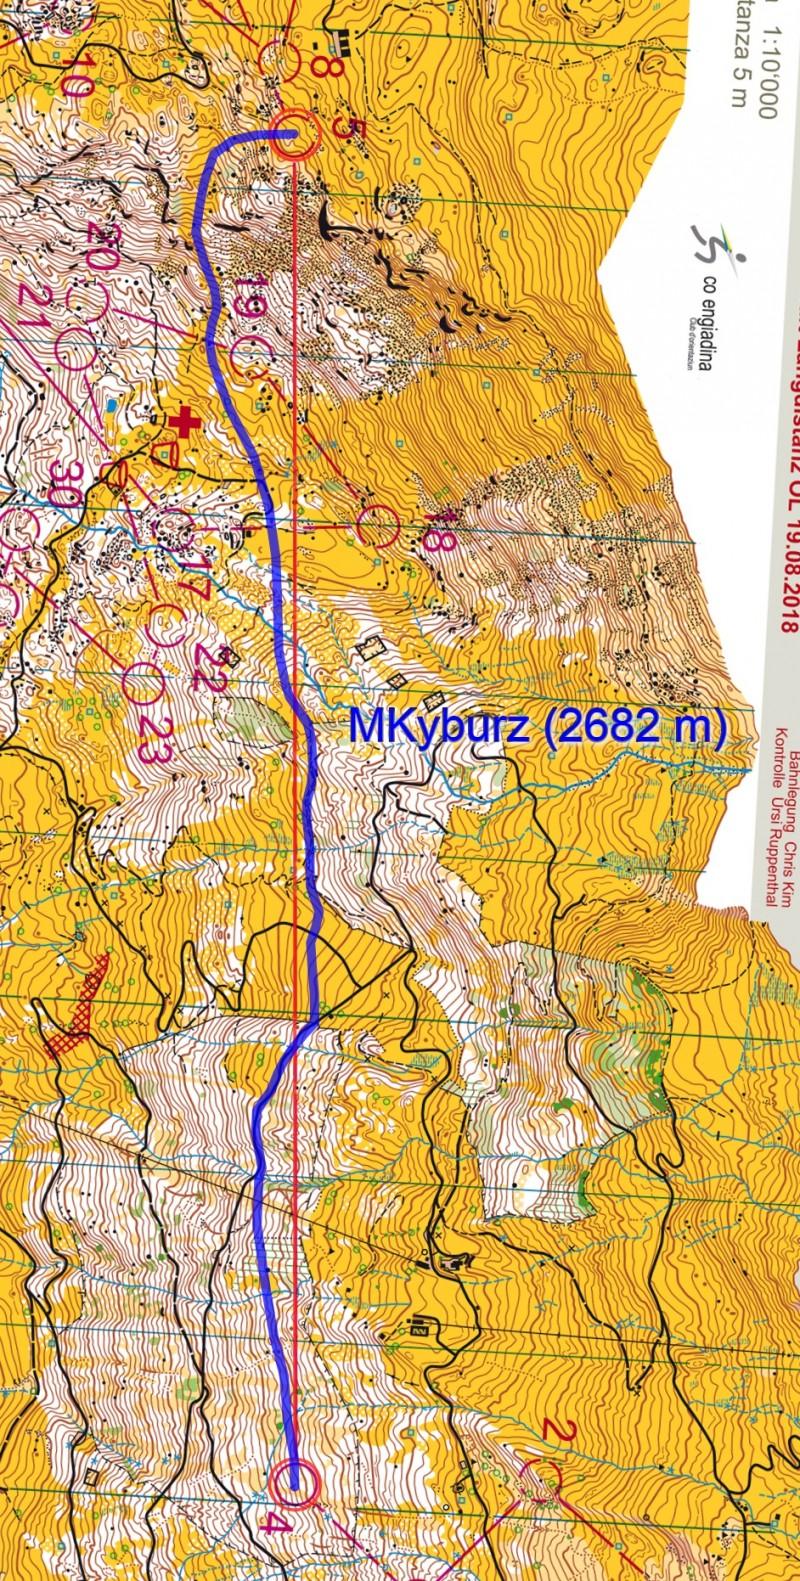 mkyburz